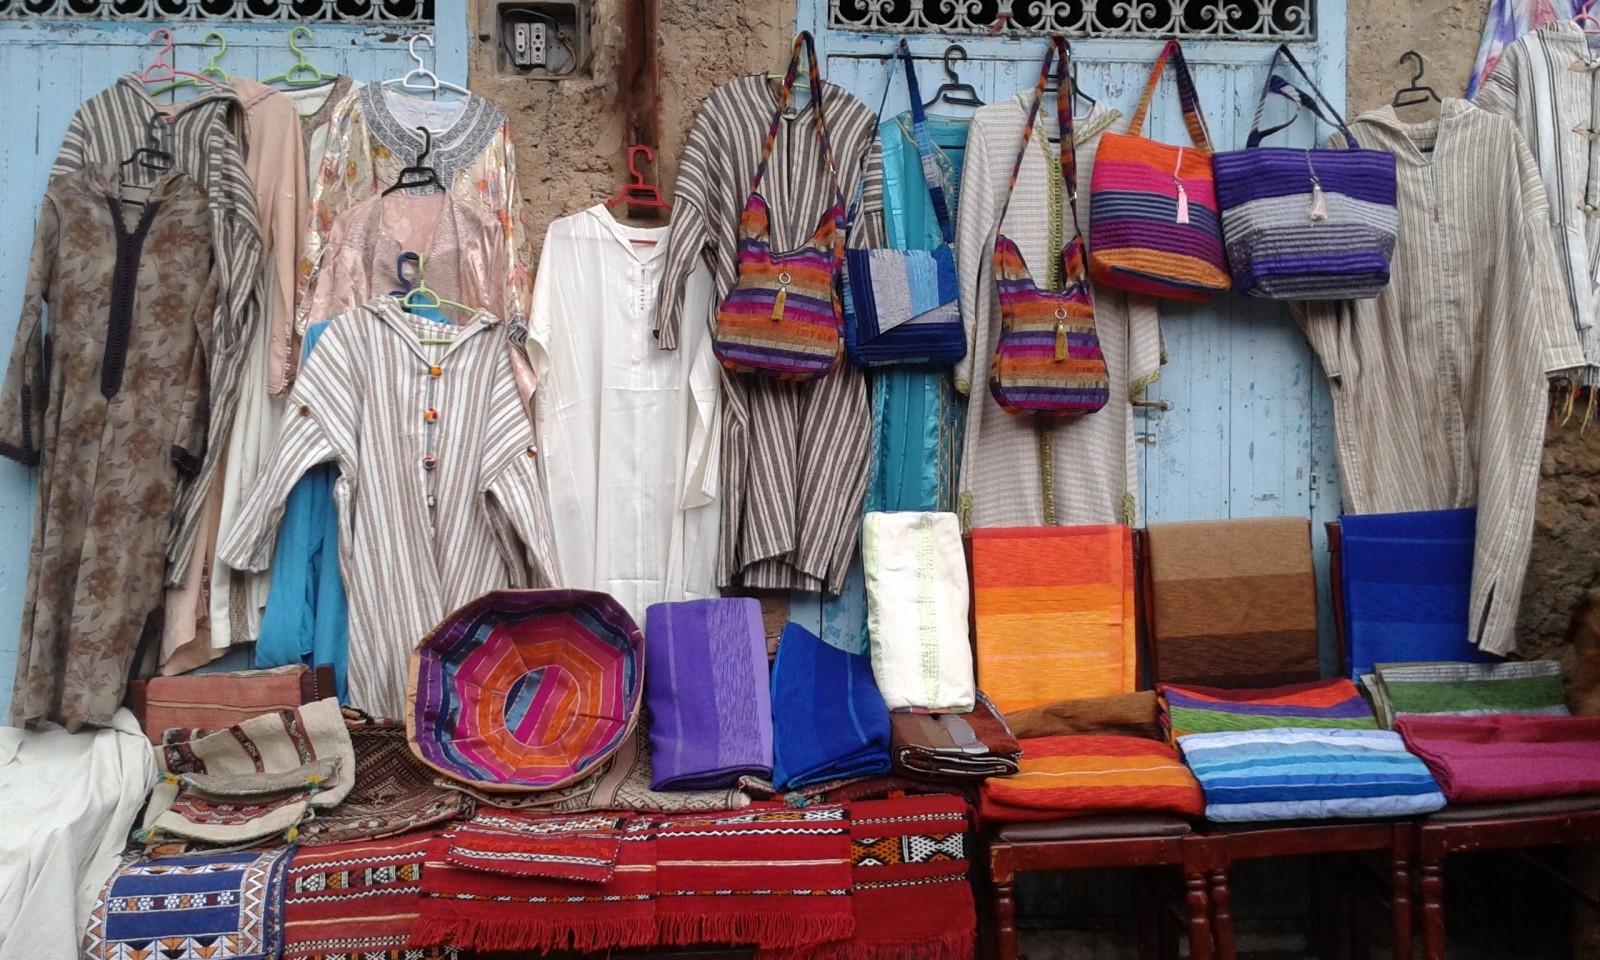 scams in Marrakech